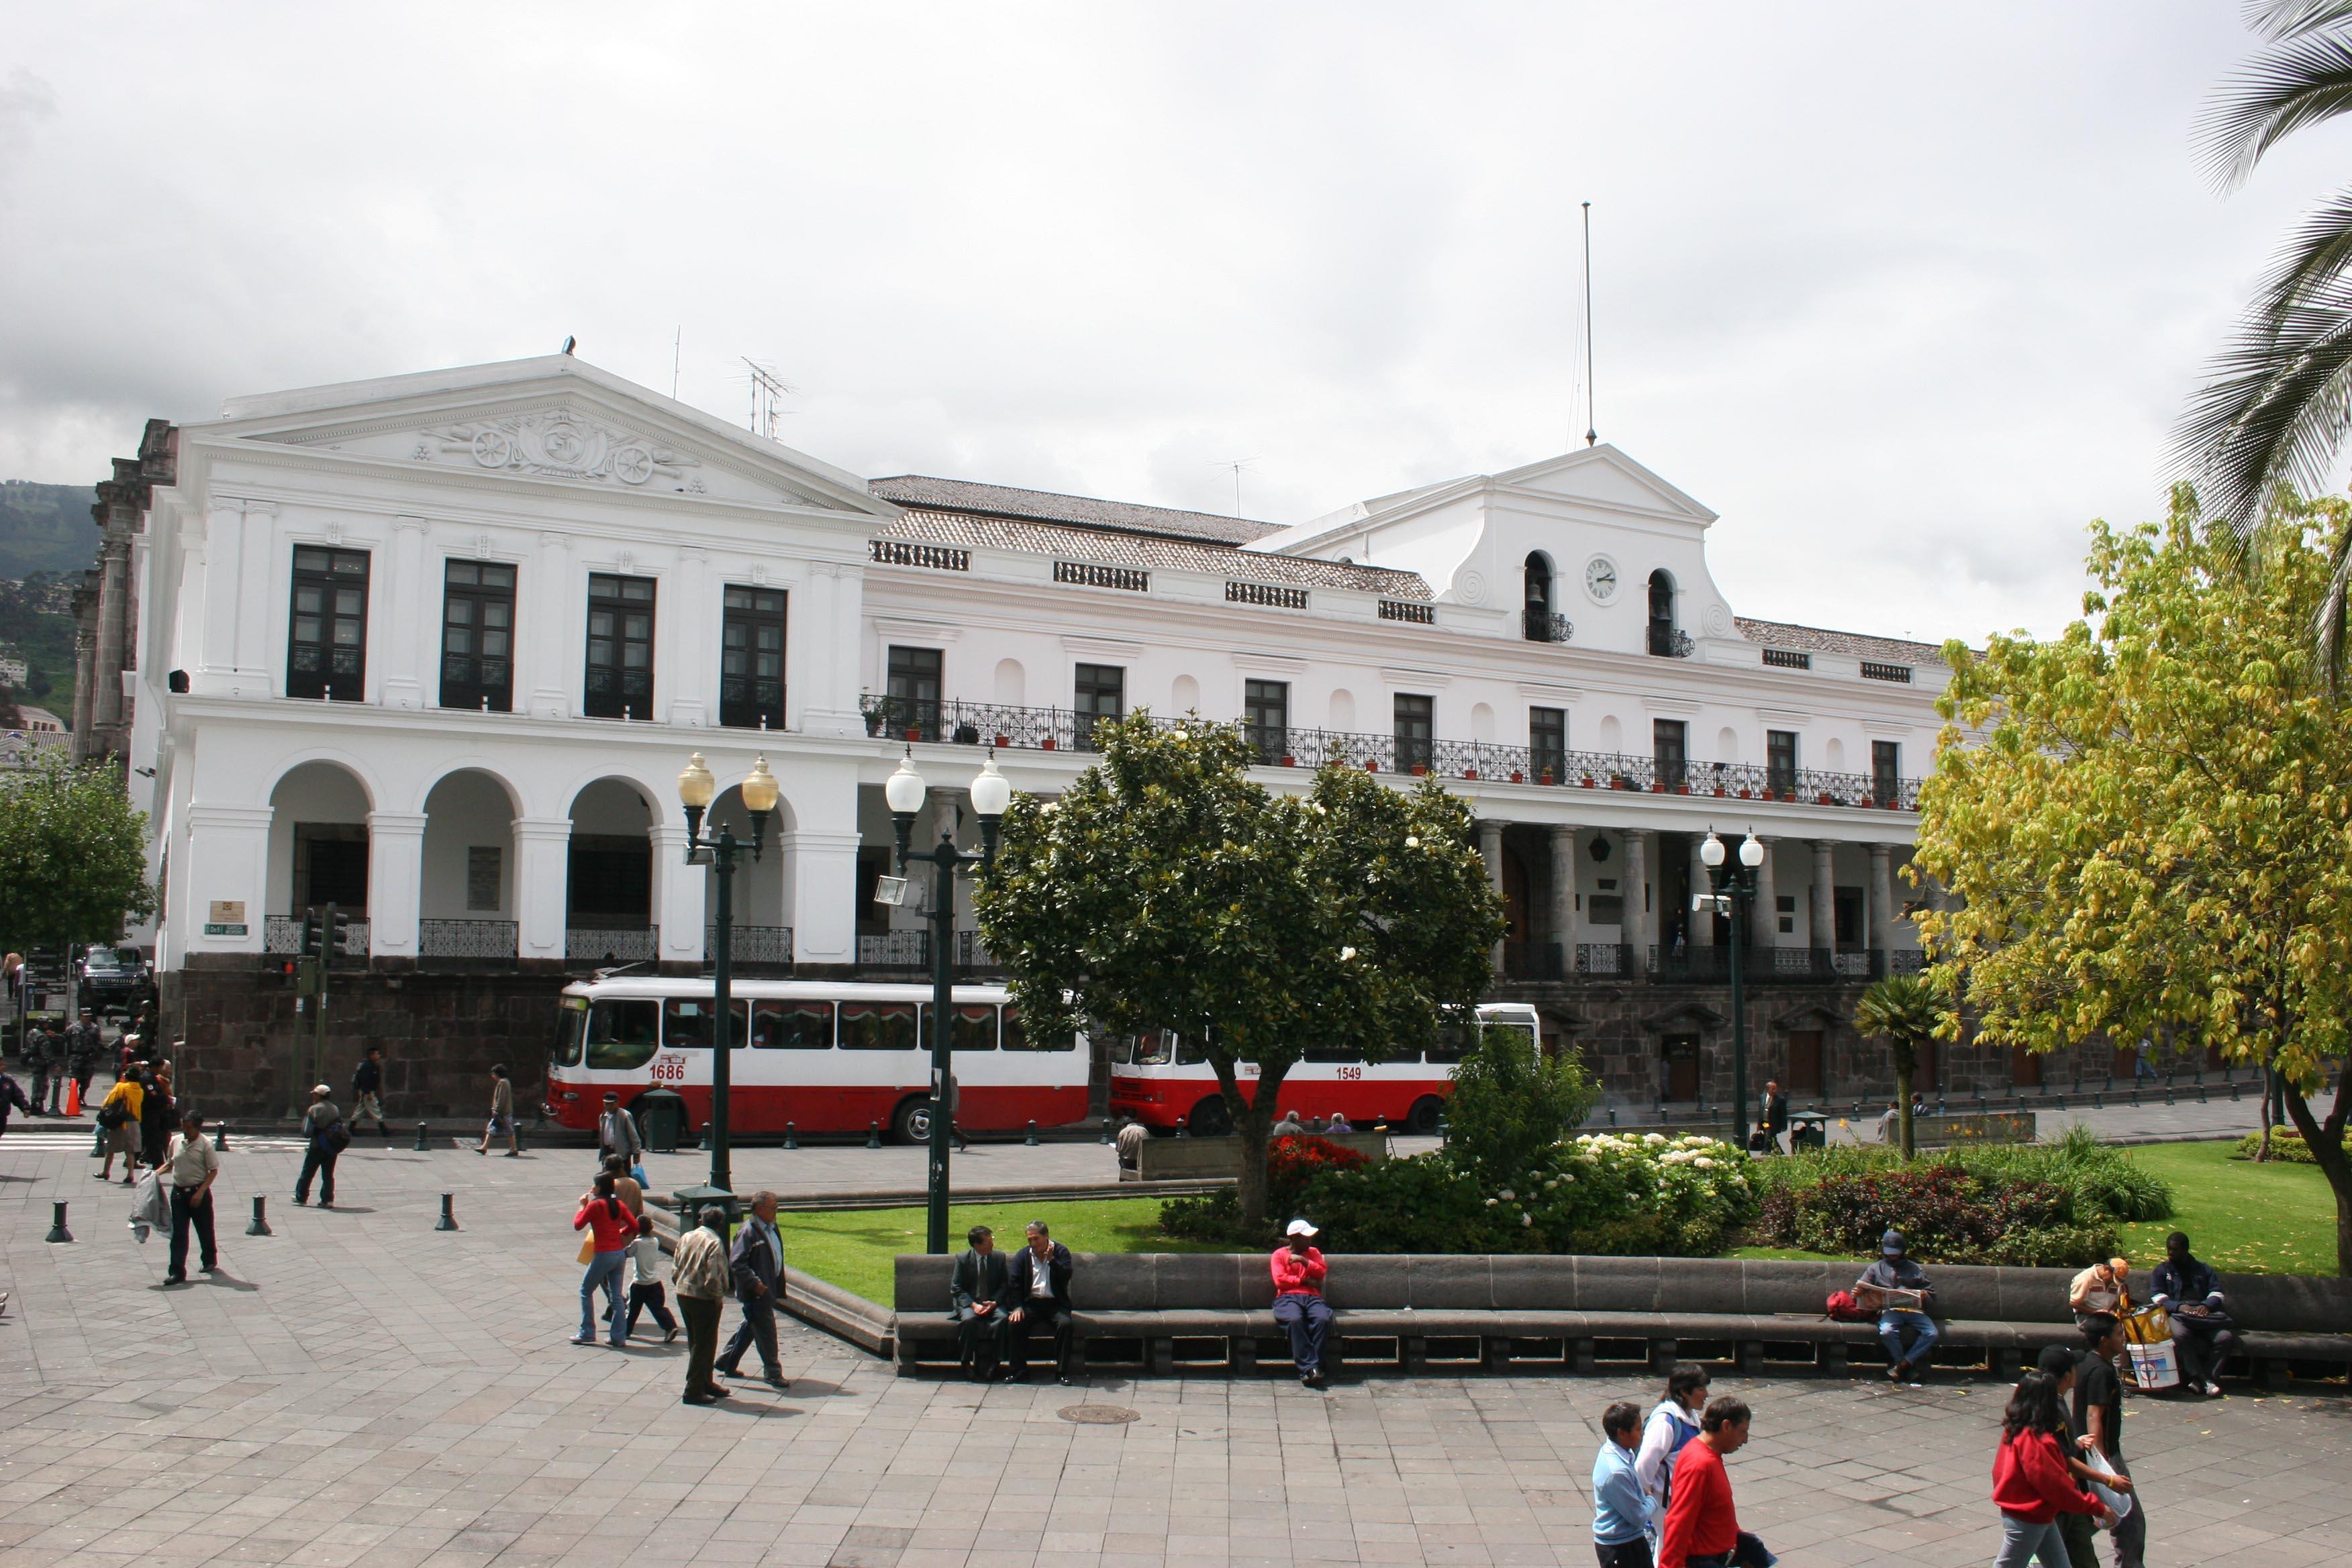 Otavalo market visit and Hacienda stay - Experience 3